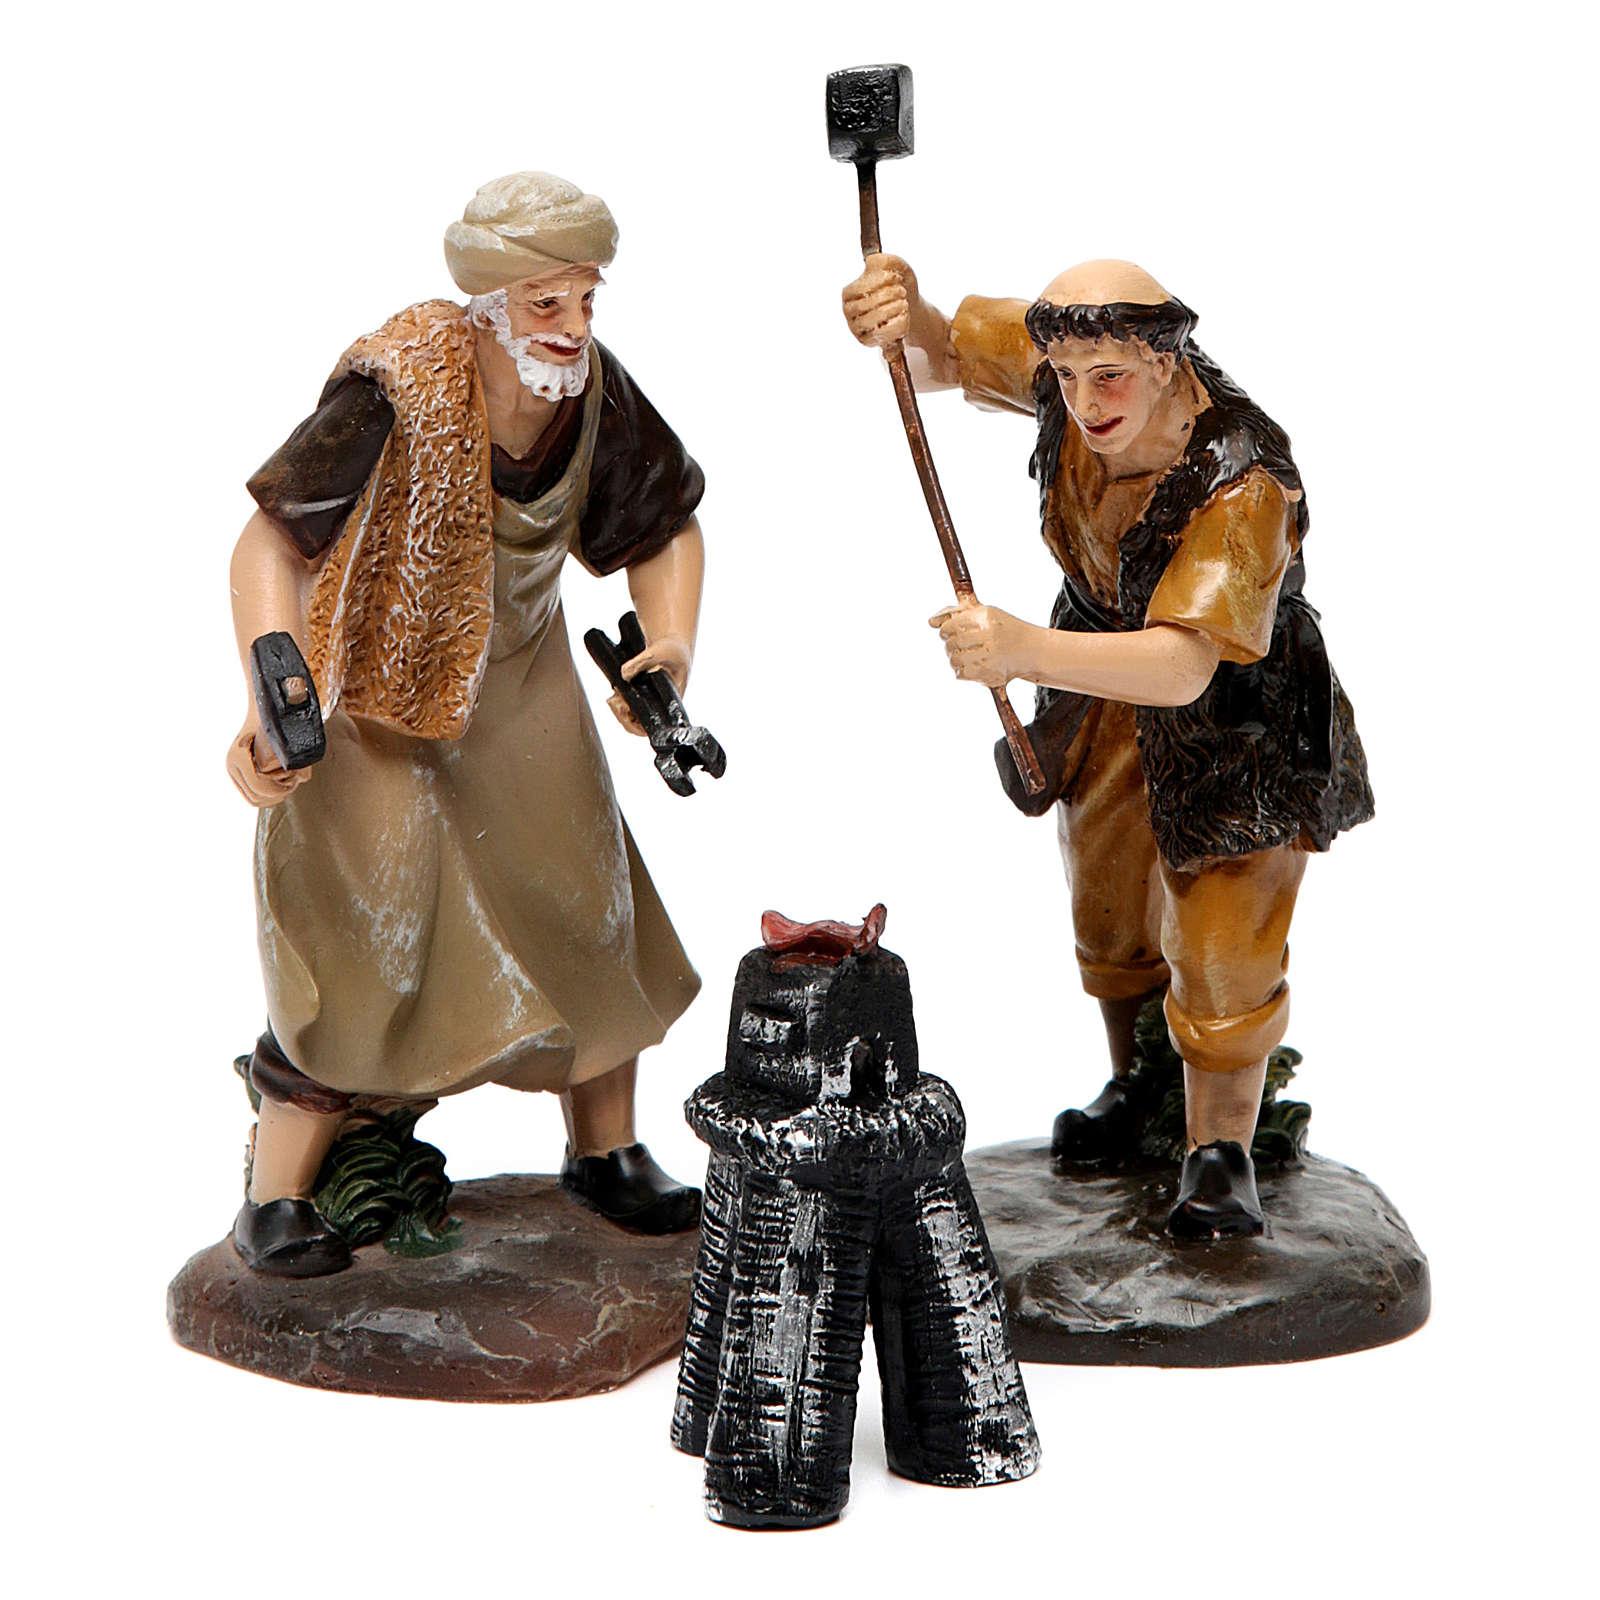 Blacksmiths with smithy 13 cm 3 pieces 3